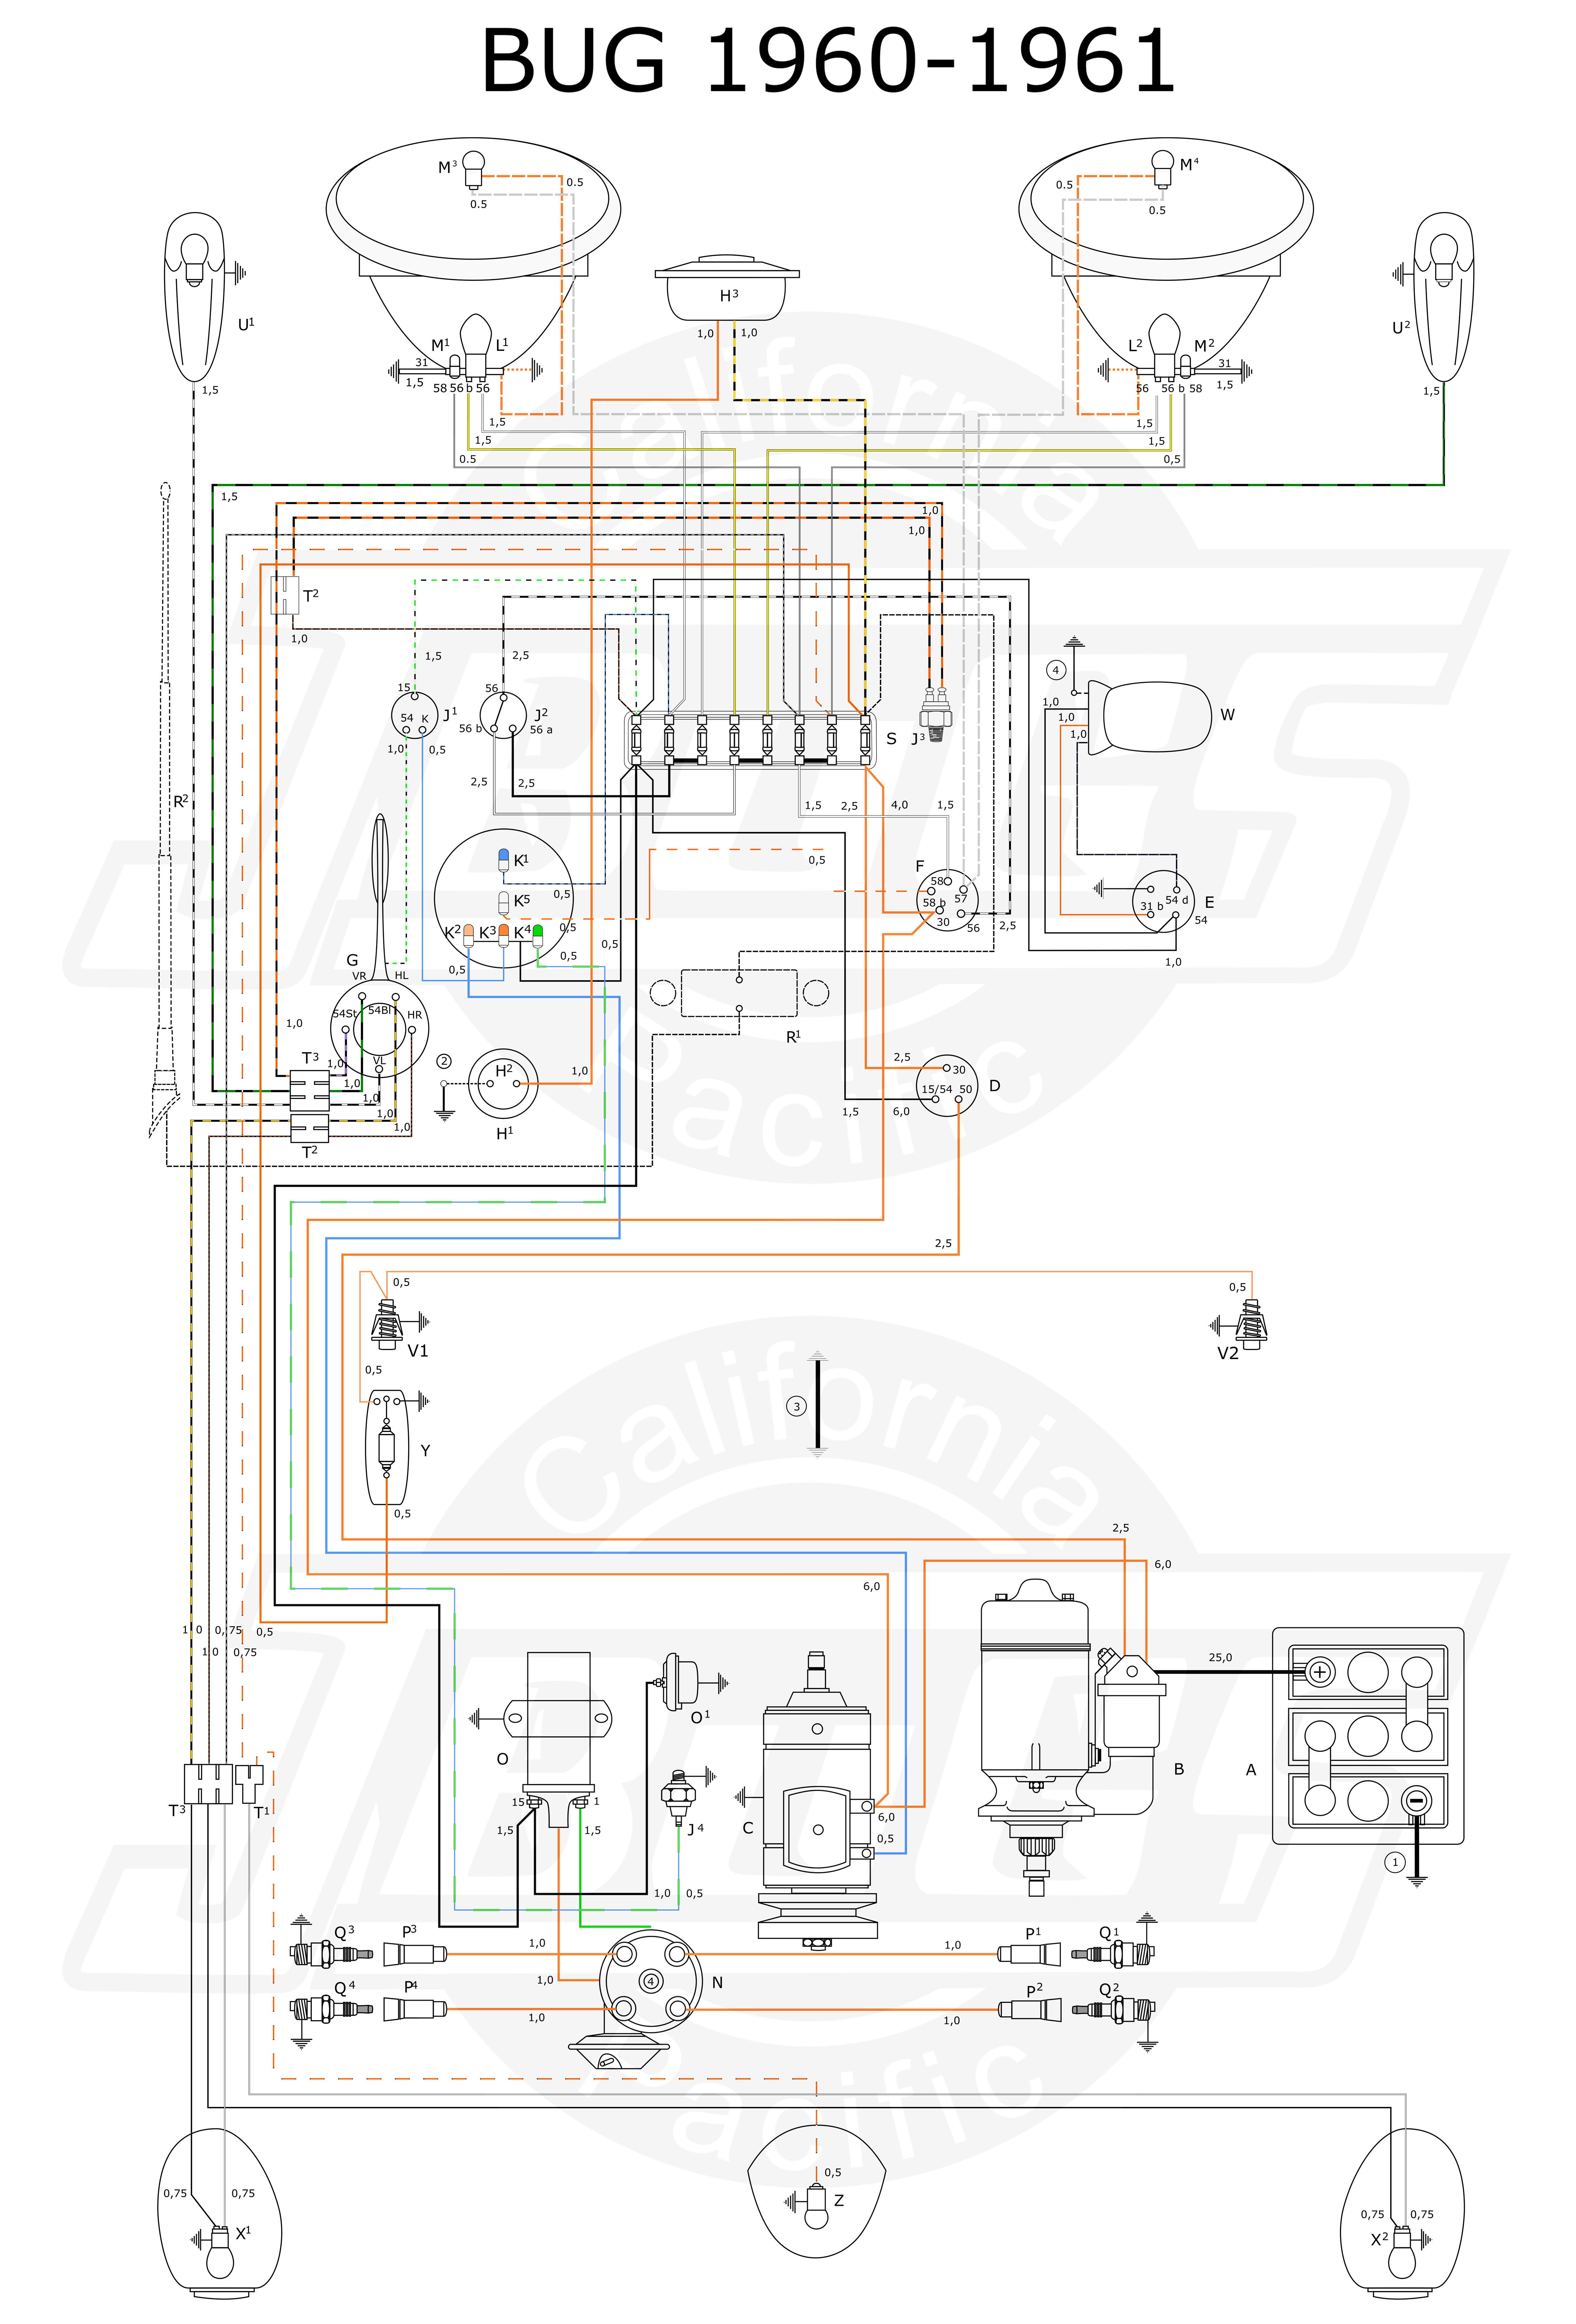 Vw Tech Article 1960 61 Wiring Diagram Vw Beetle Classic Vw Bug Diagram